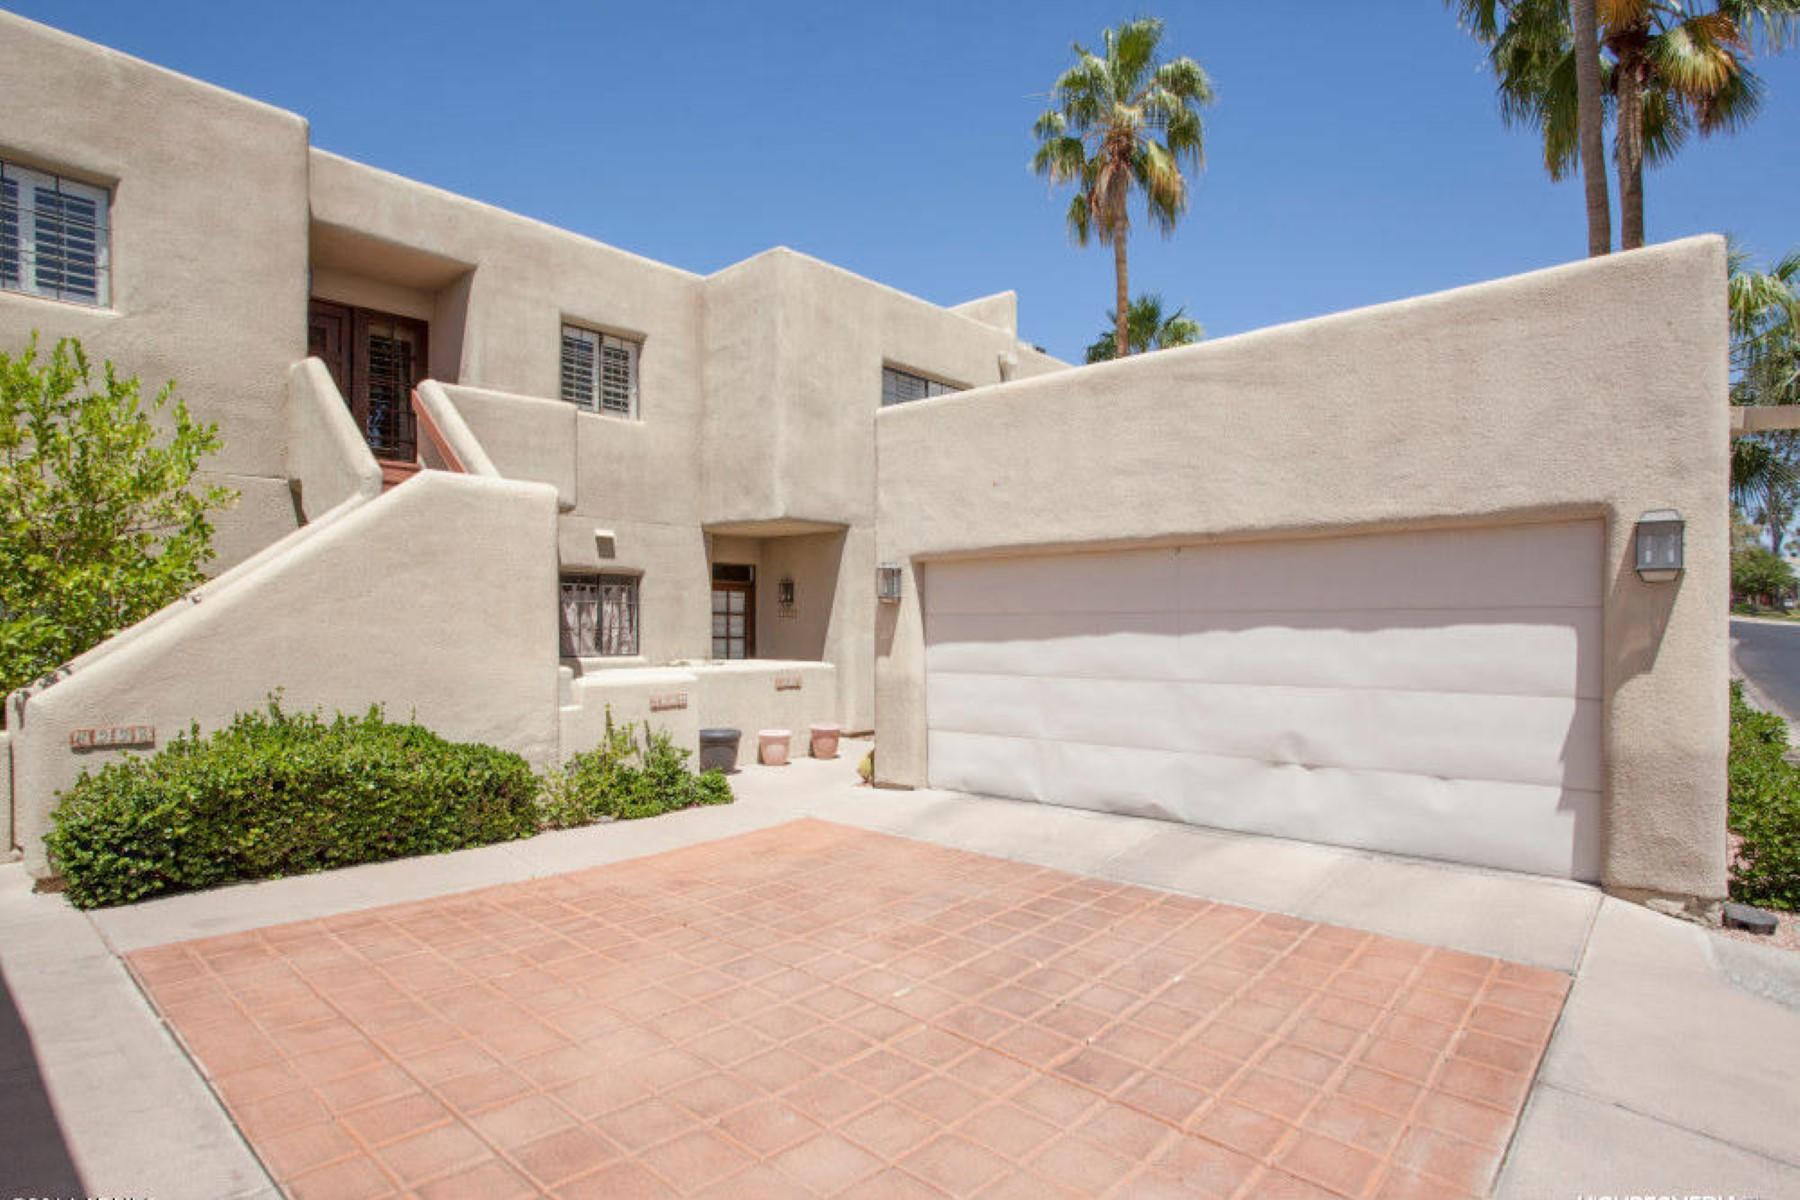 Townhouse for Sale at Biltmore Courts located in the prestigious Arizona Biltmore Estates Village. 6226 N 30TH PL Phoenix, Arizona, 85016 United States